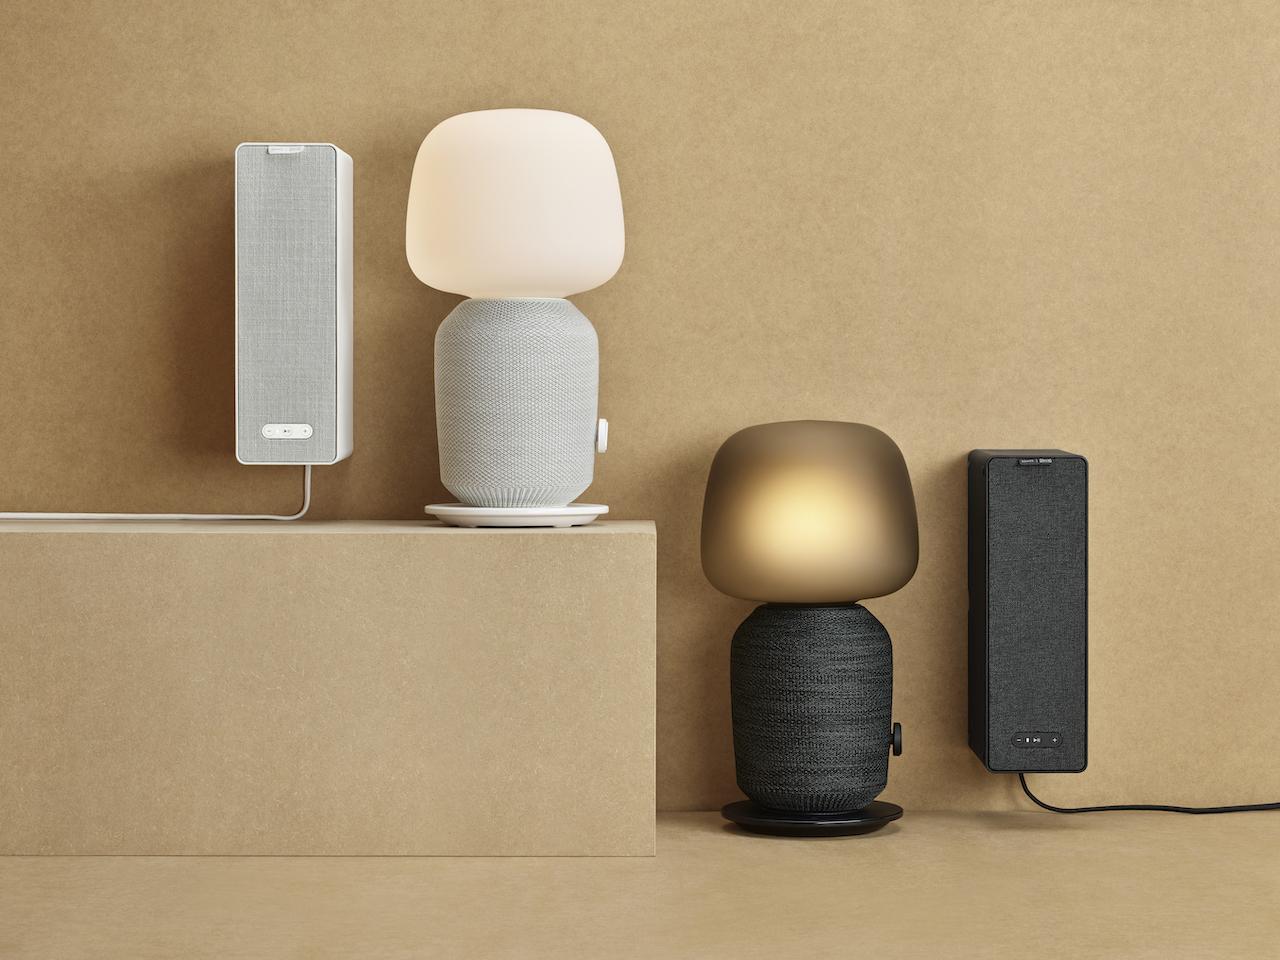 Symfonisk Audio By Sonos E Design By Ikea Milanofinanzait